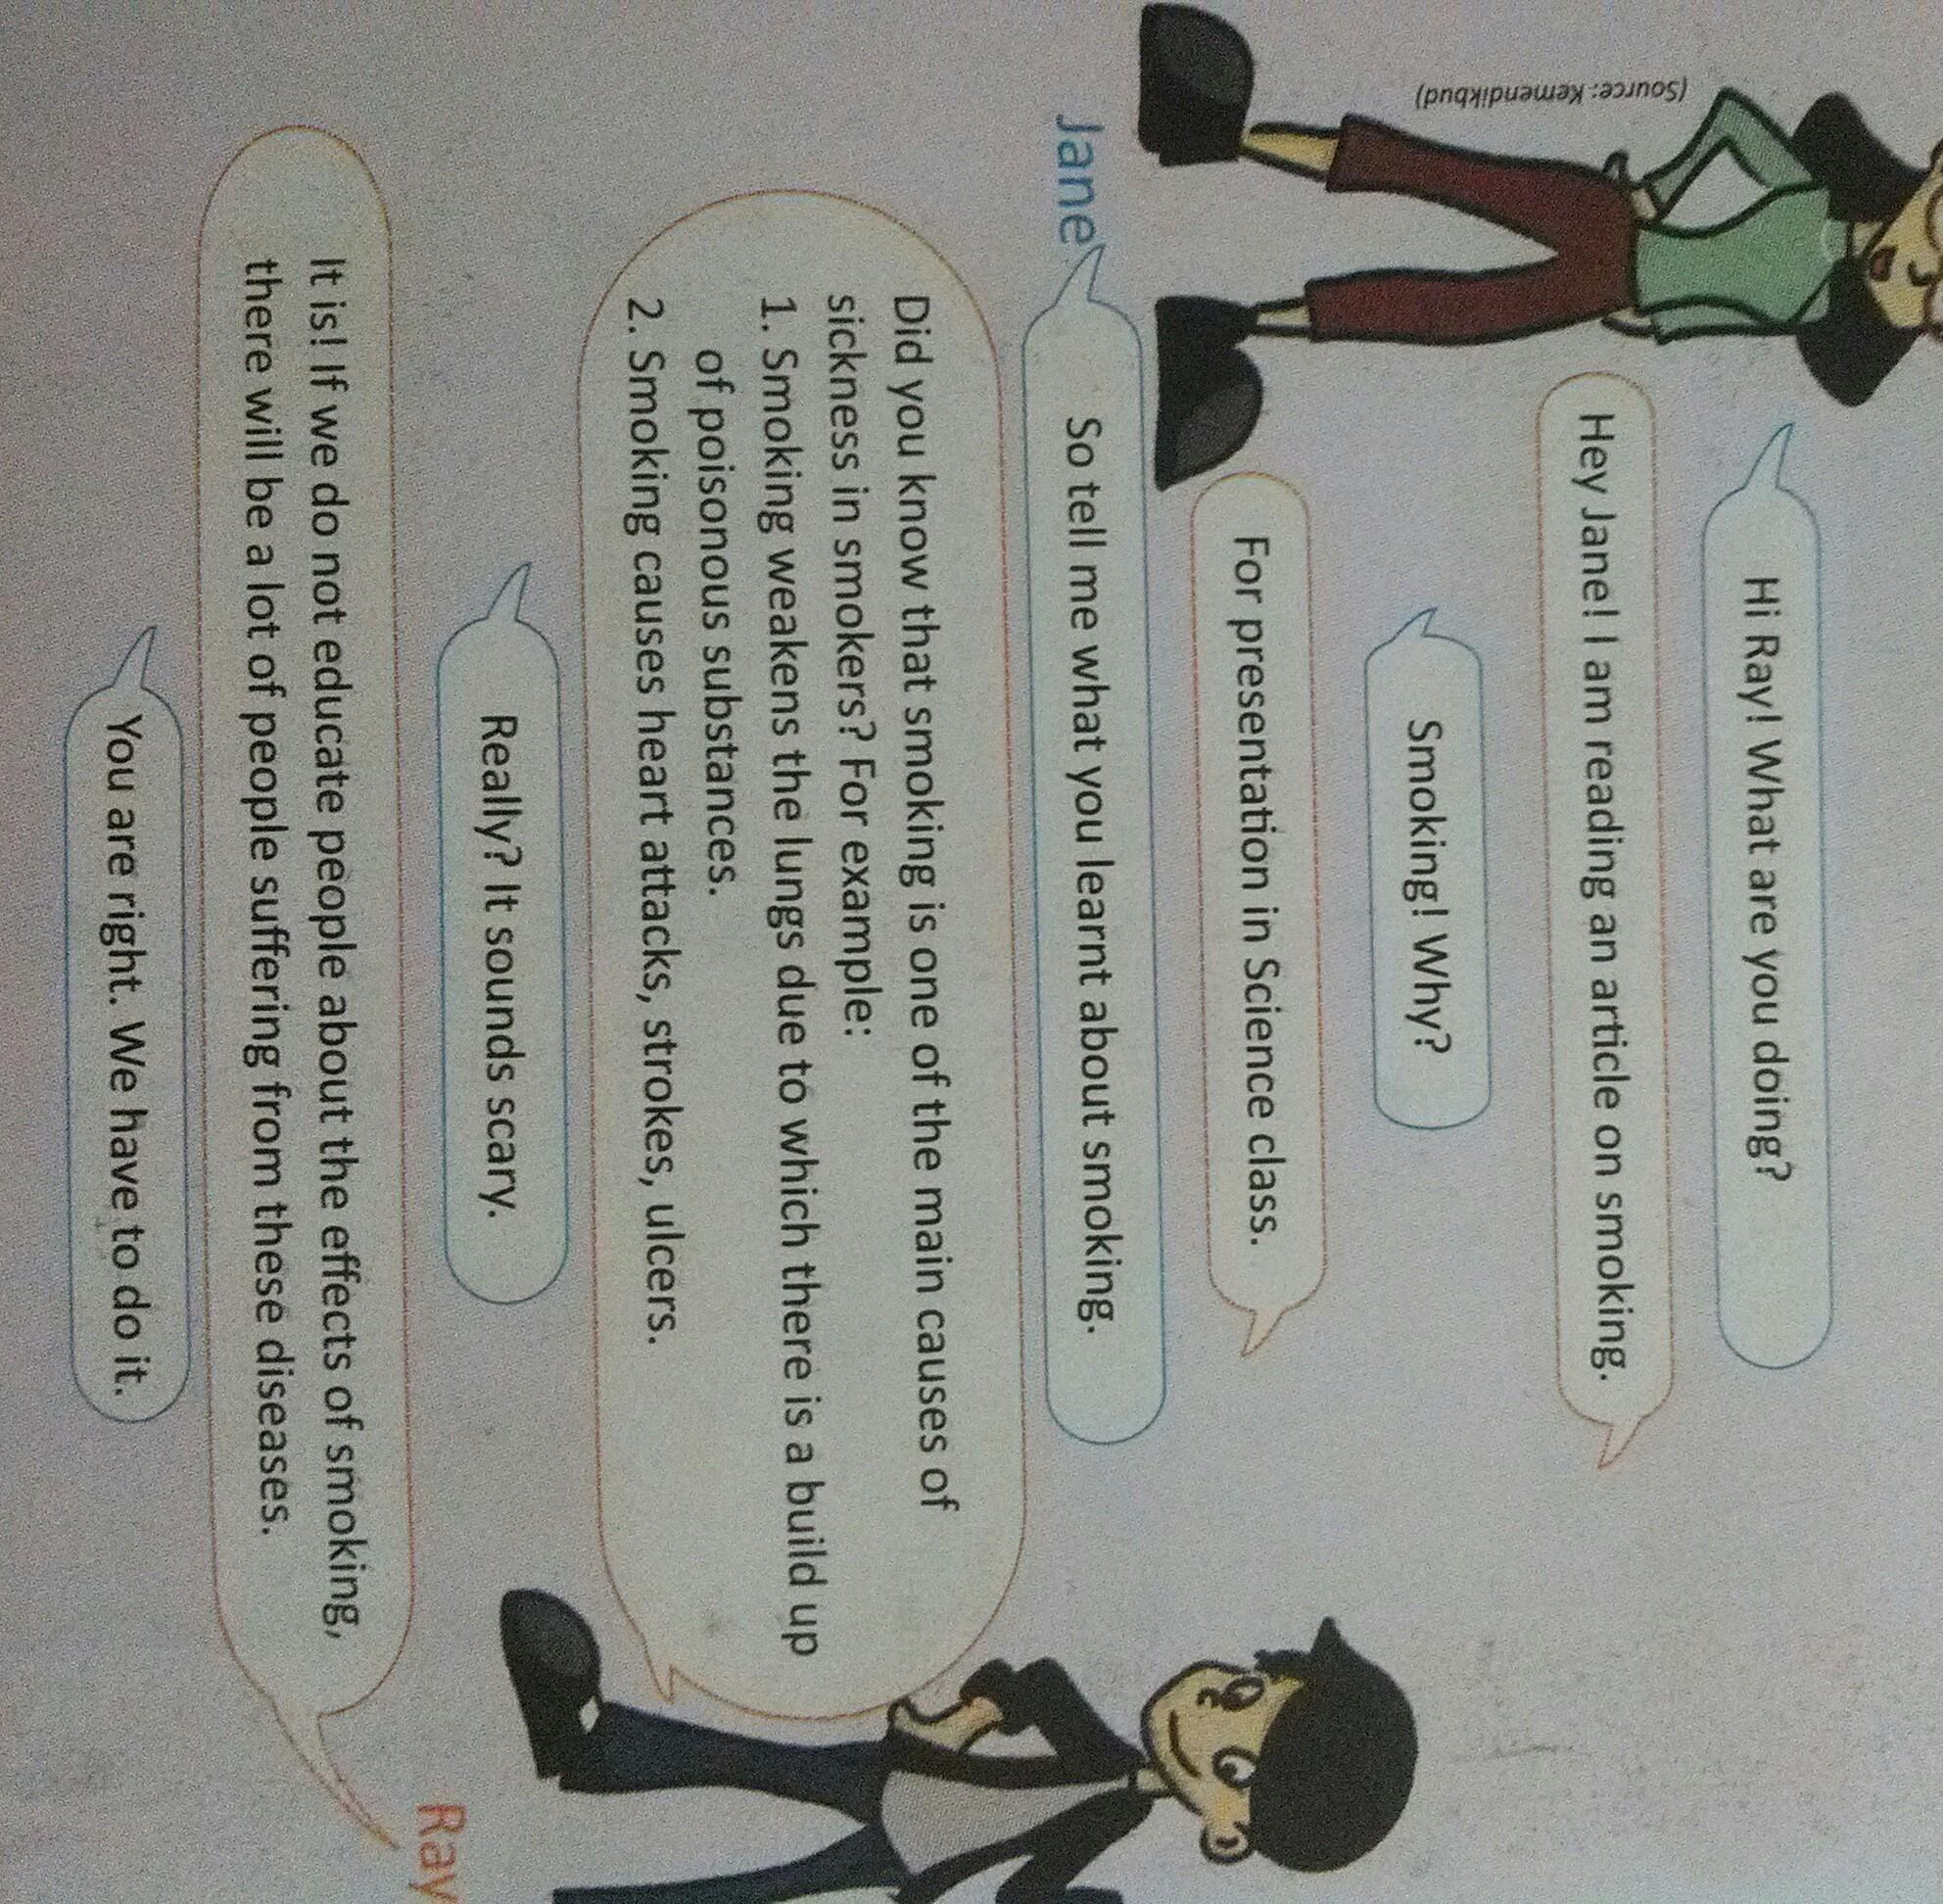 Contoh Dialog Bahasa Inggris Cause Smoking And Effect Smoking